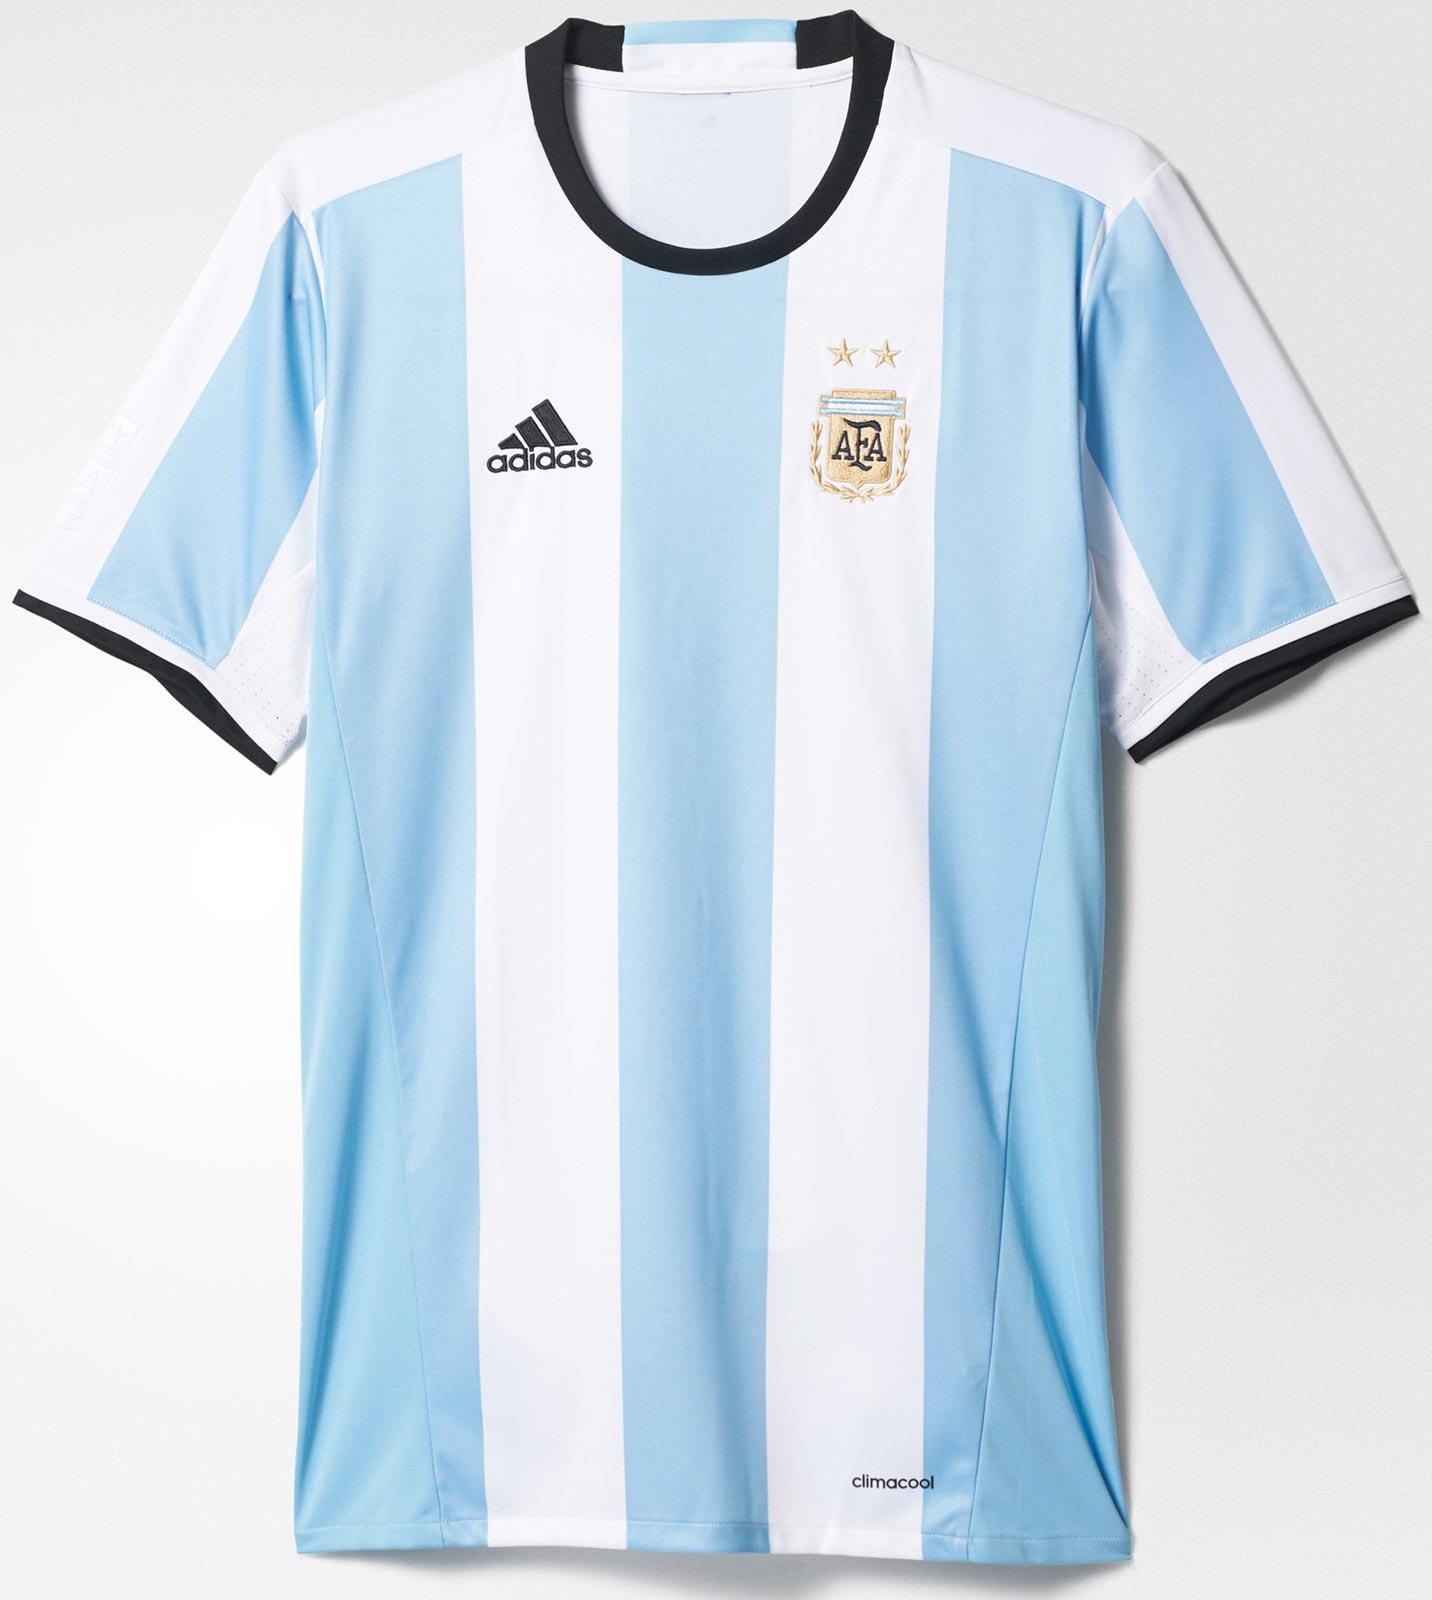 4f1a5ea2af8f Design Your Own Adidas Football Shirt - BCD Tofu House